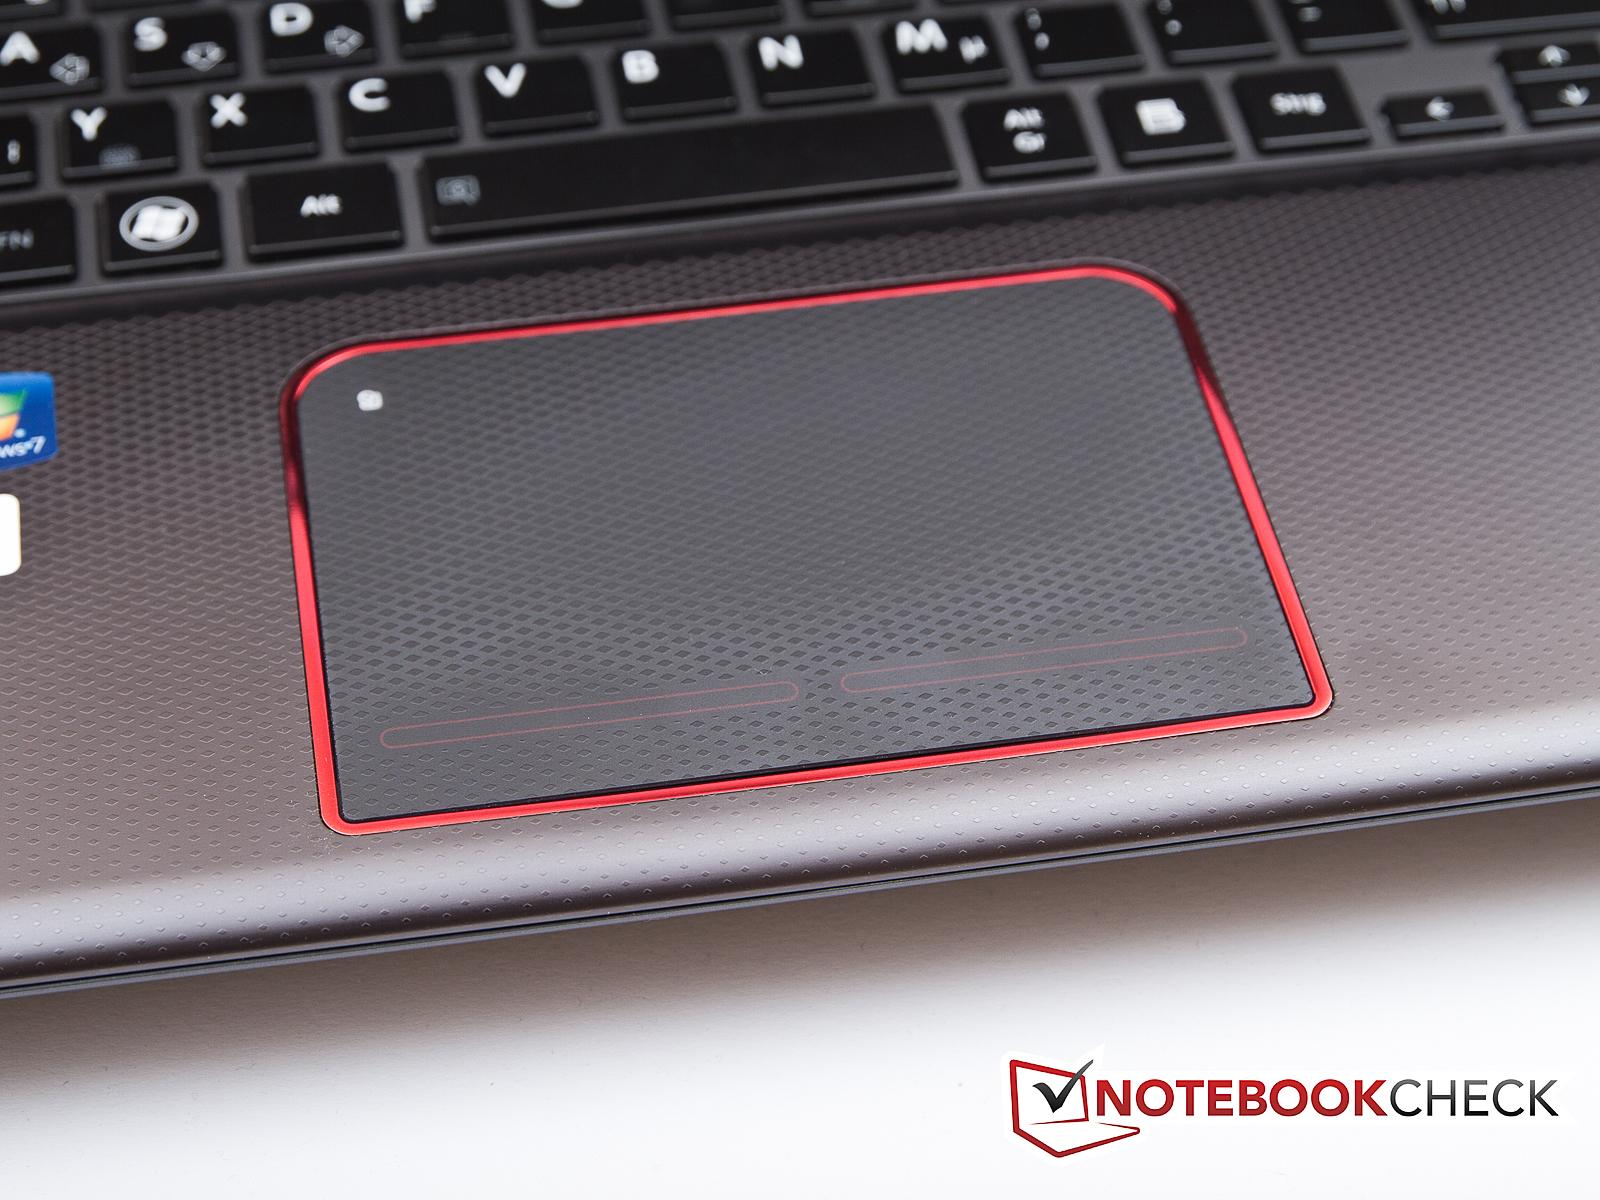 Touchpad Keyboard The Toshiba X870